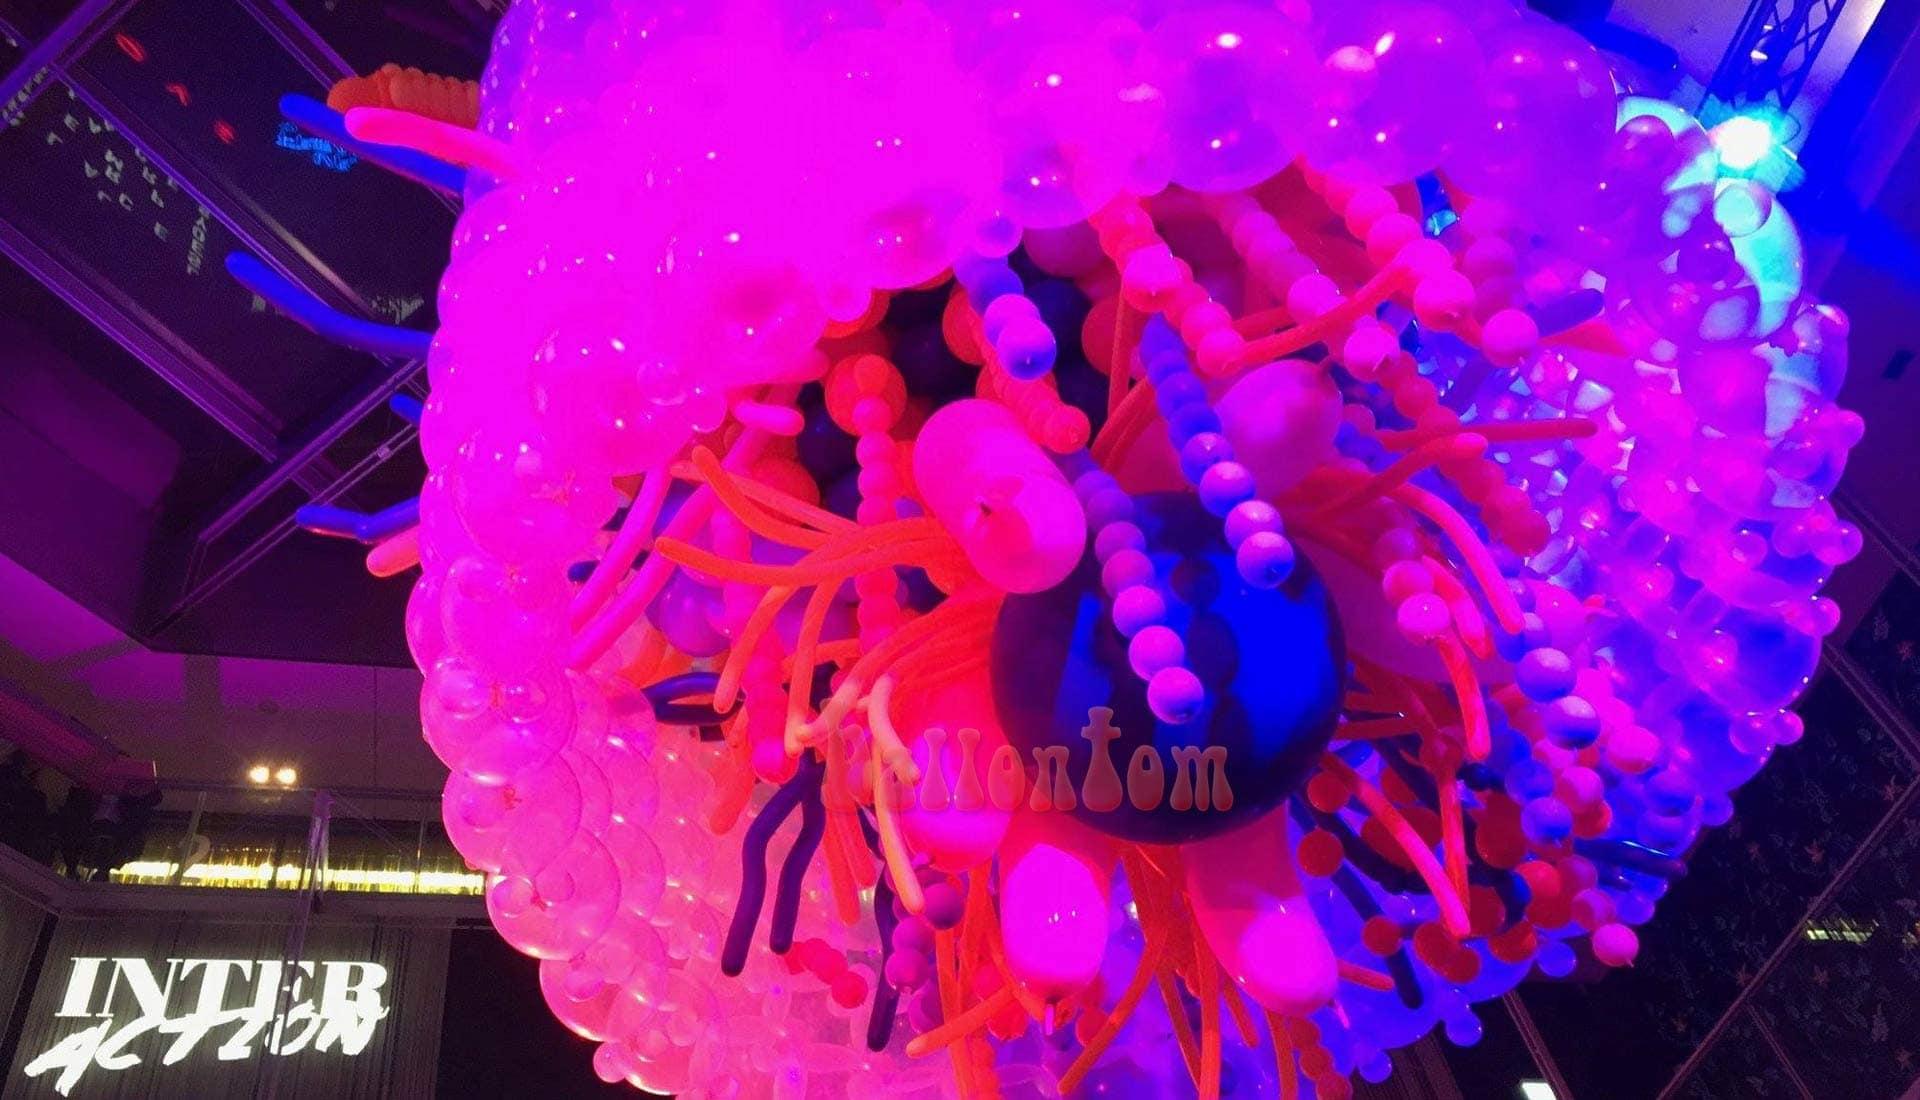 Silvesterprojekt 2018 in München - Projekt: Sina Greinert - Unterstützung durch ballontom